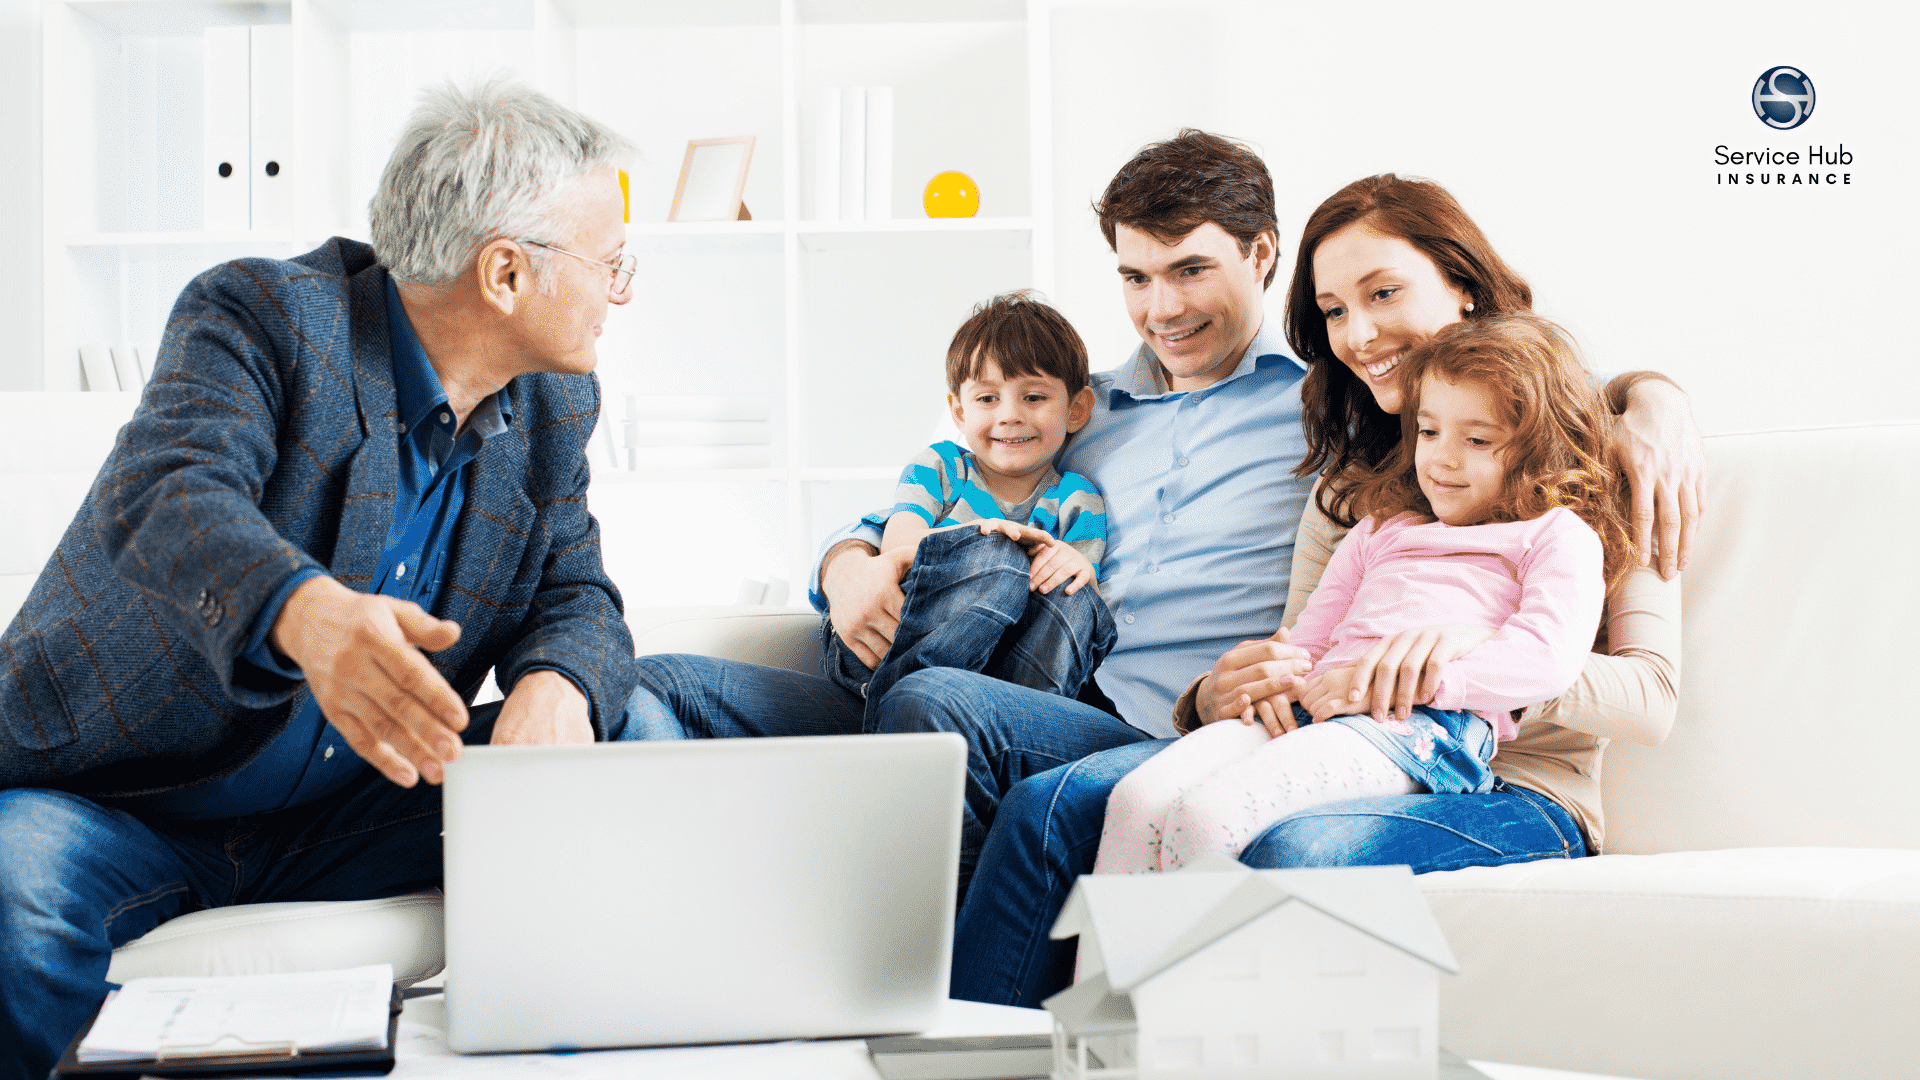 Universal Life Insurance - Service Hub Insurance